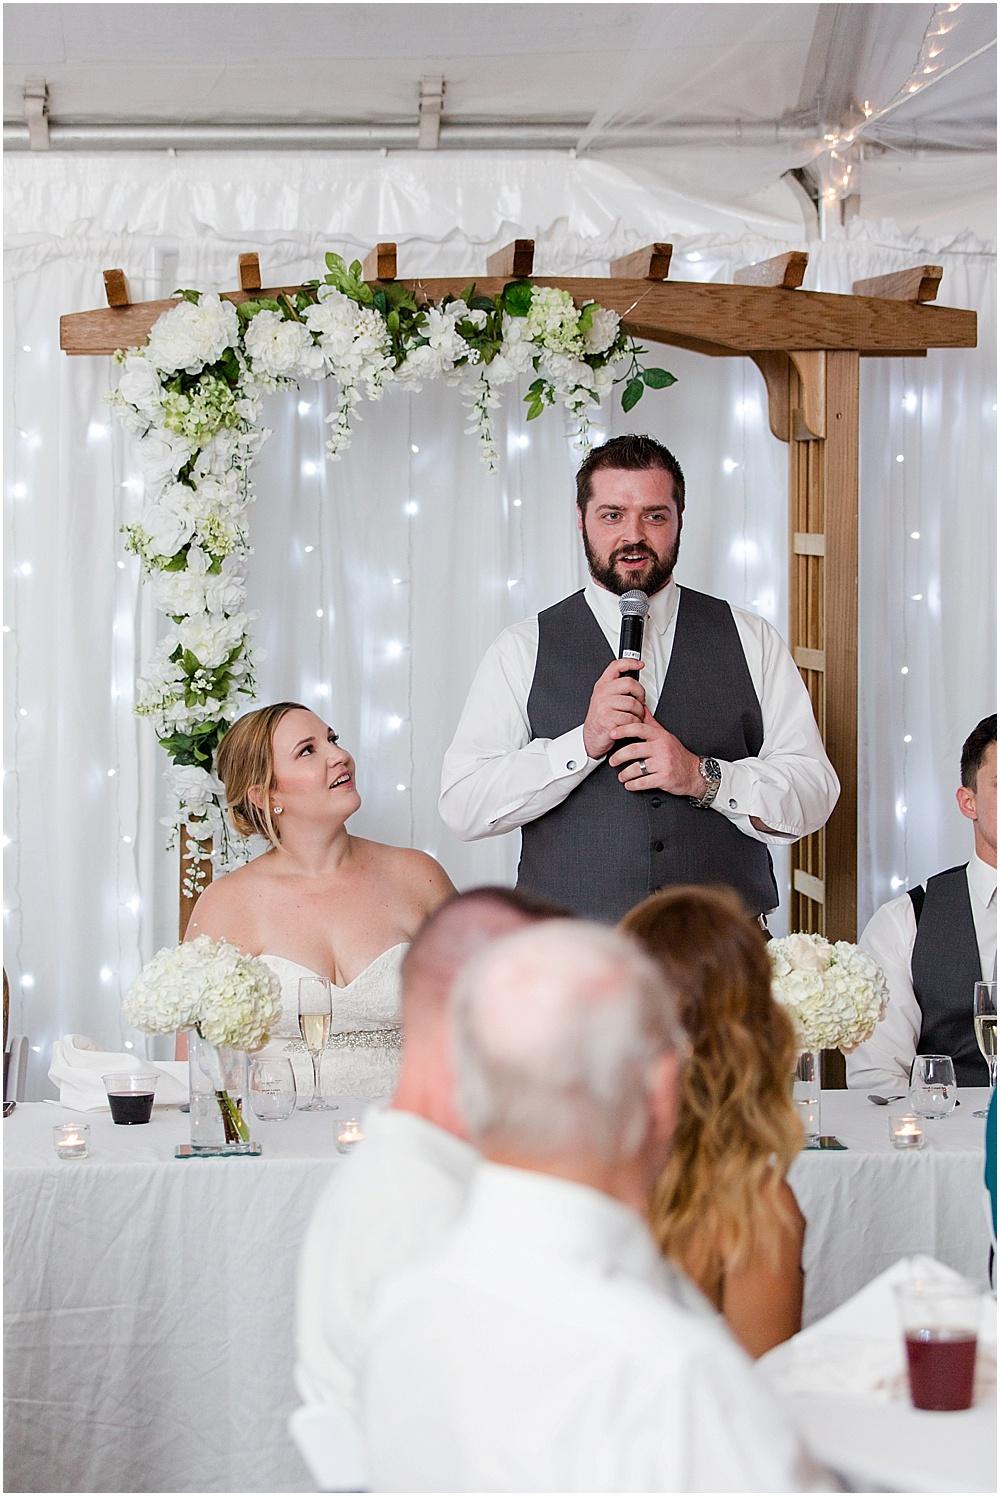 mitzner_silverdale_beach_hotel_wedding_silverdale_washington_pacific_northwest_wedding_photographer_0115